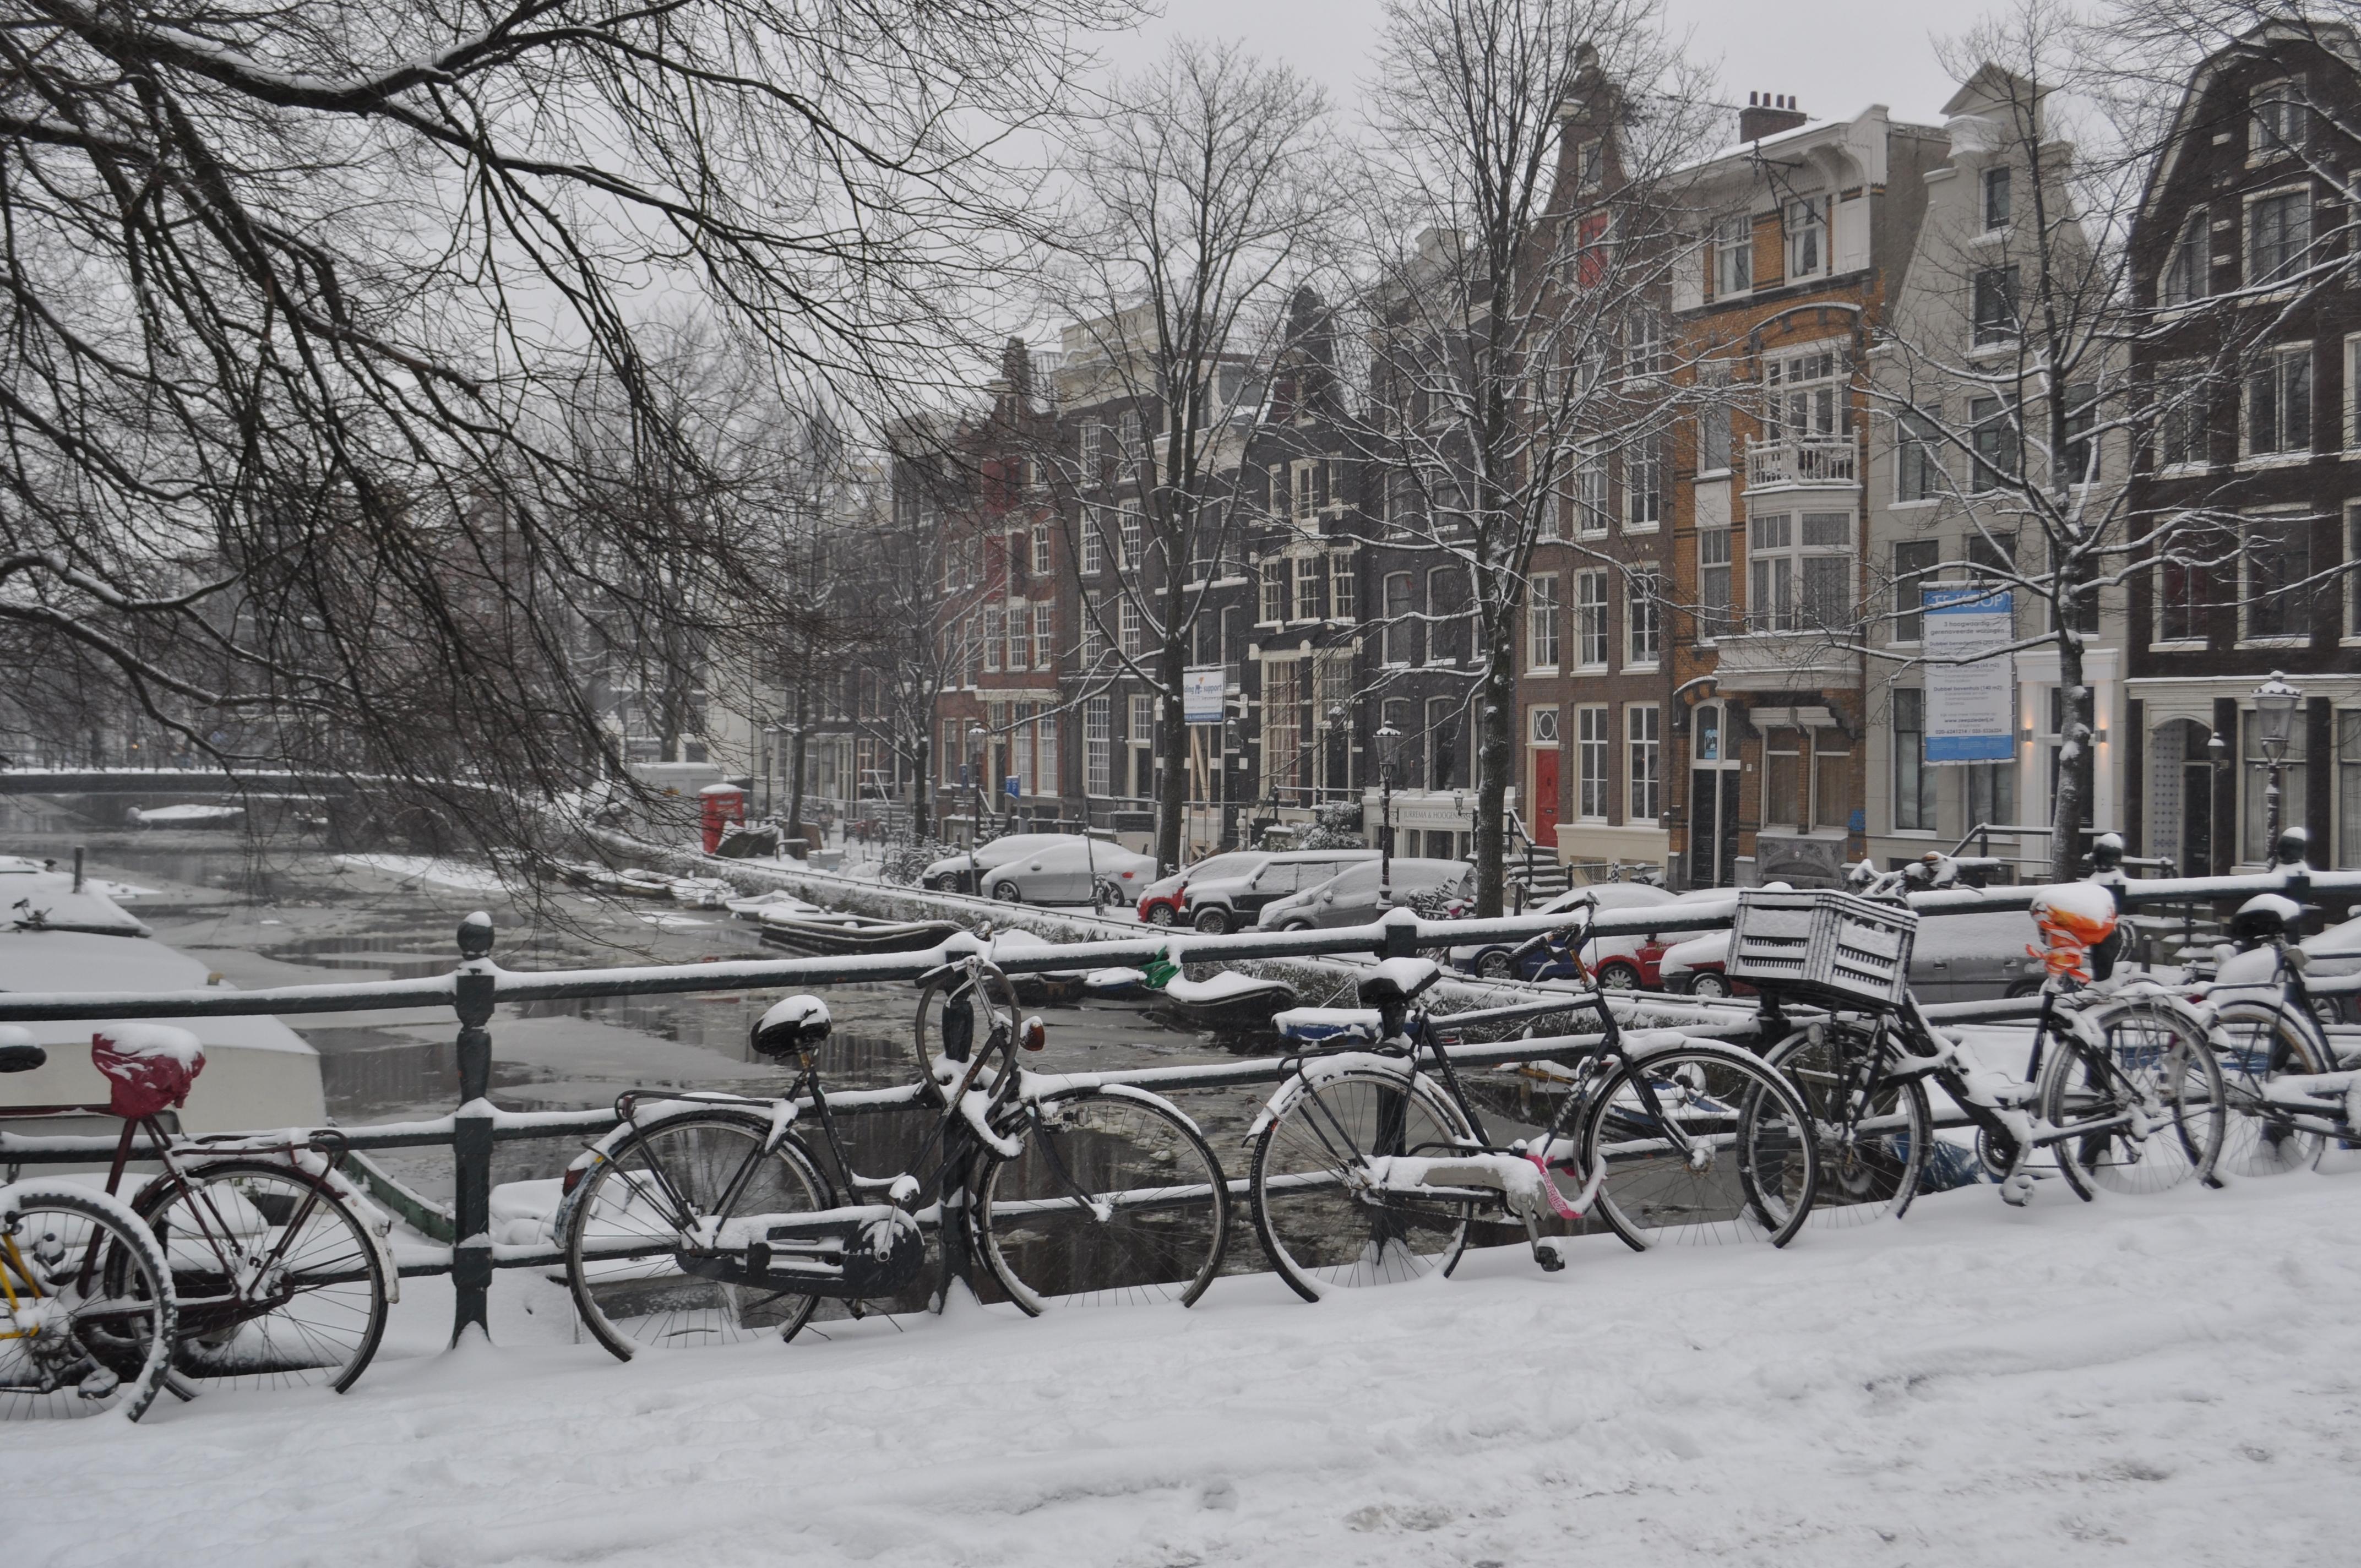 winter wonderland in amsterdam koobsgodutch. Black Bedroom Furniture Sets. Home Design Ideas